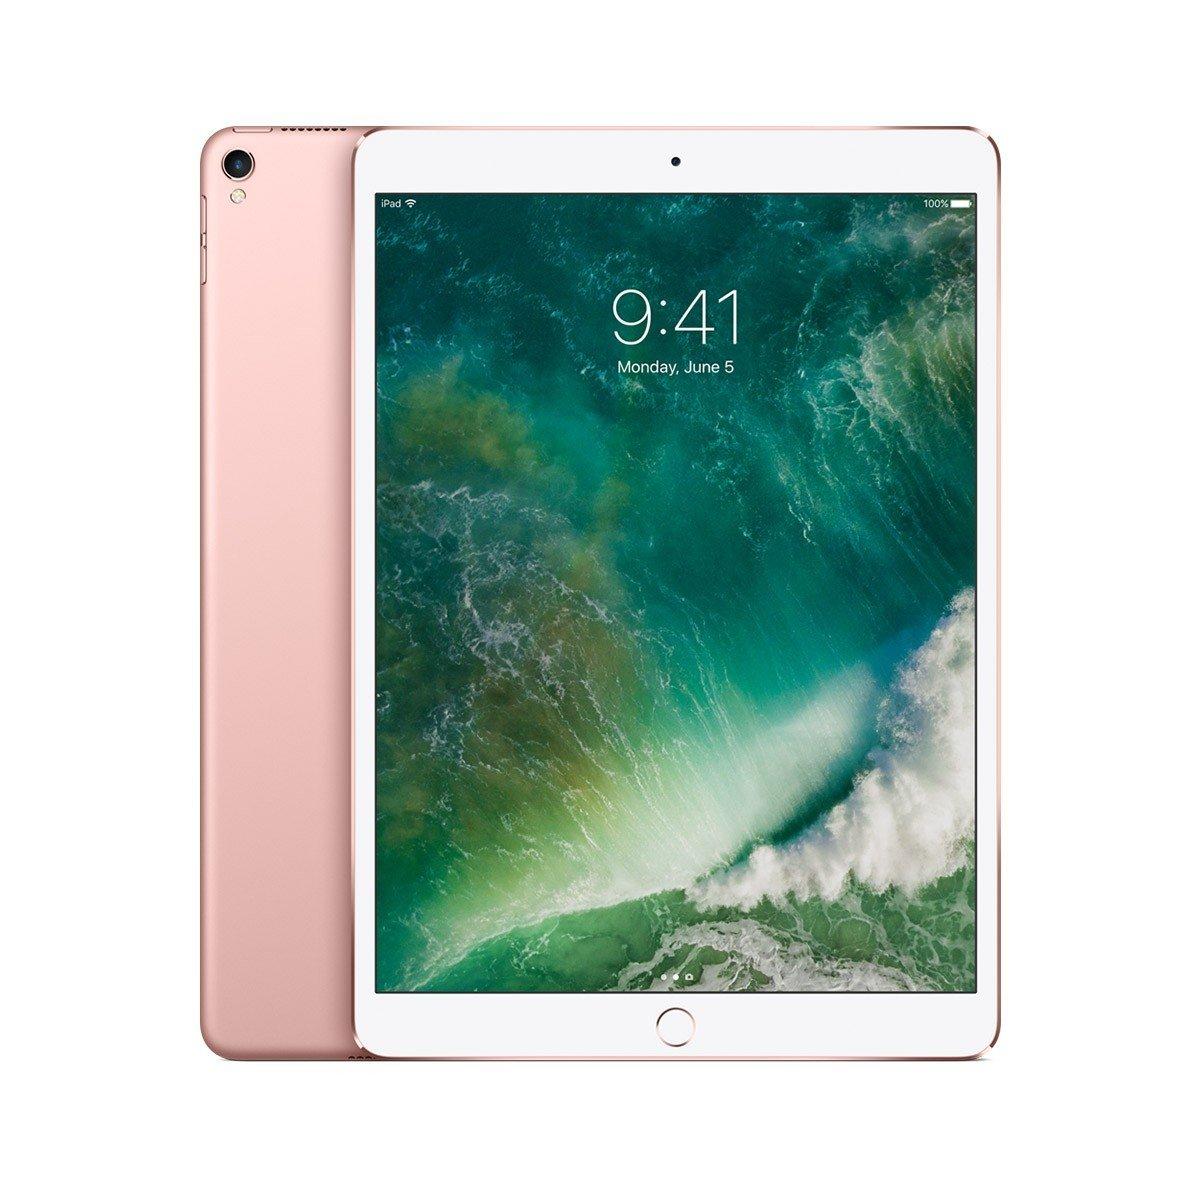 iPad Pro 10.5-inch Rose Gold